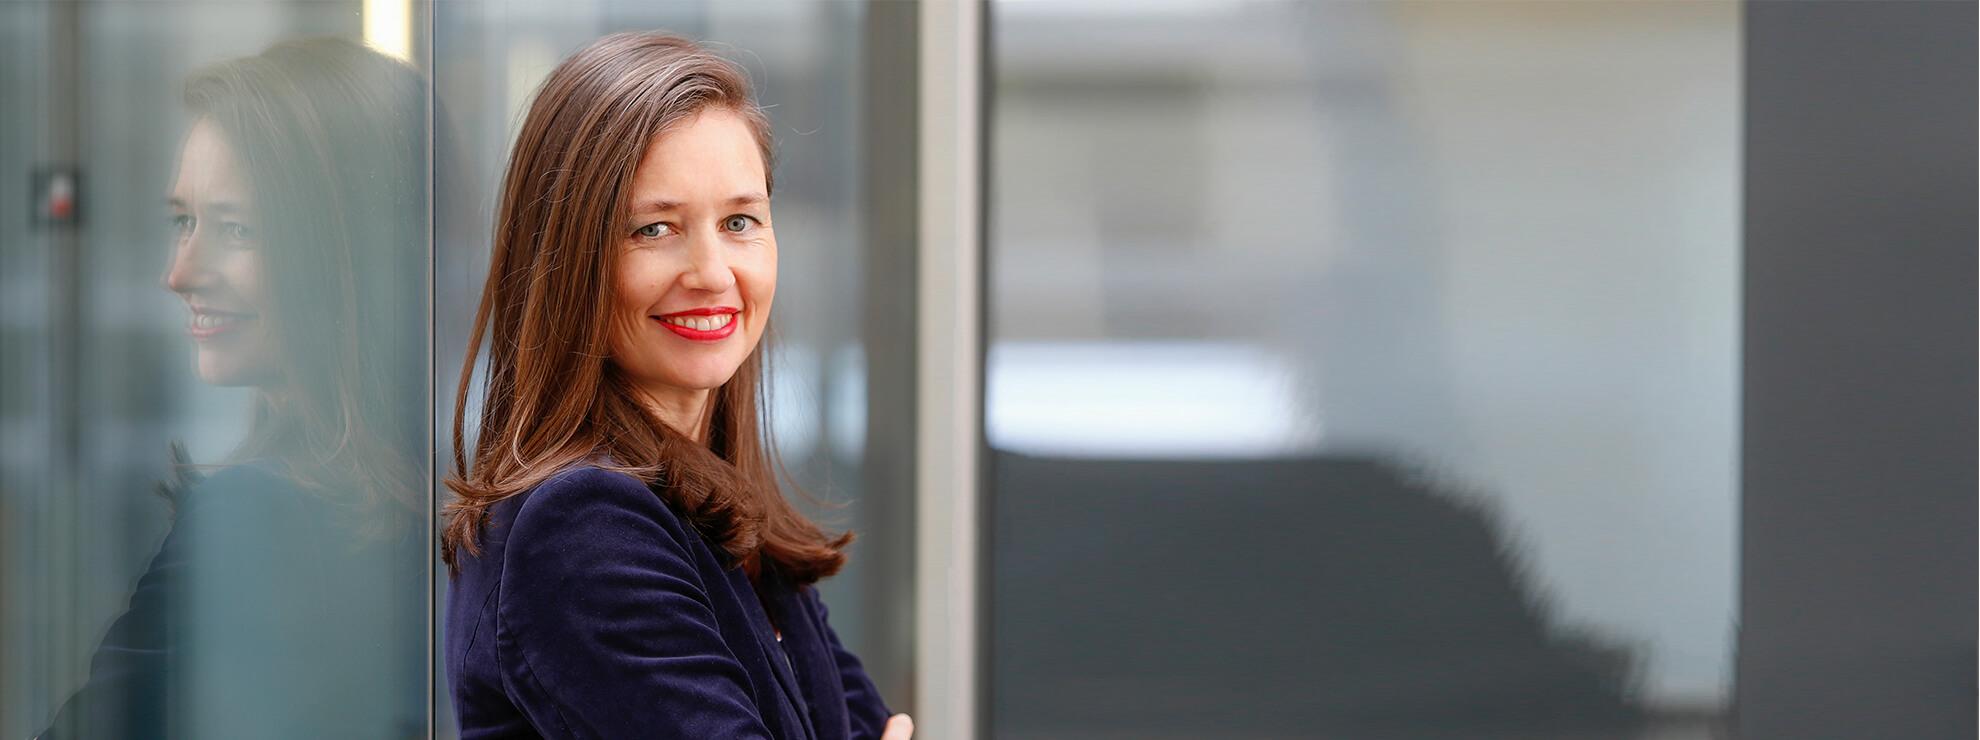 Karin Maria Schertler #outstanding value creation